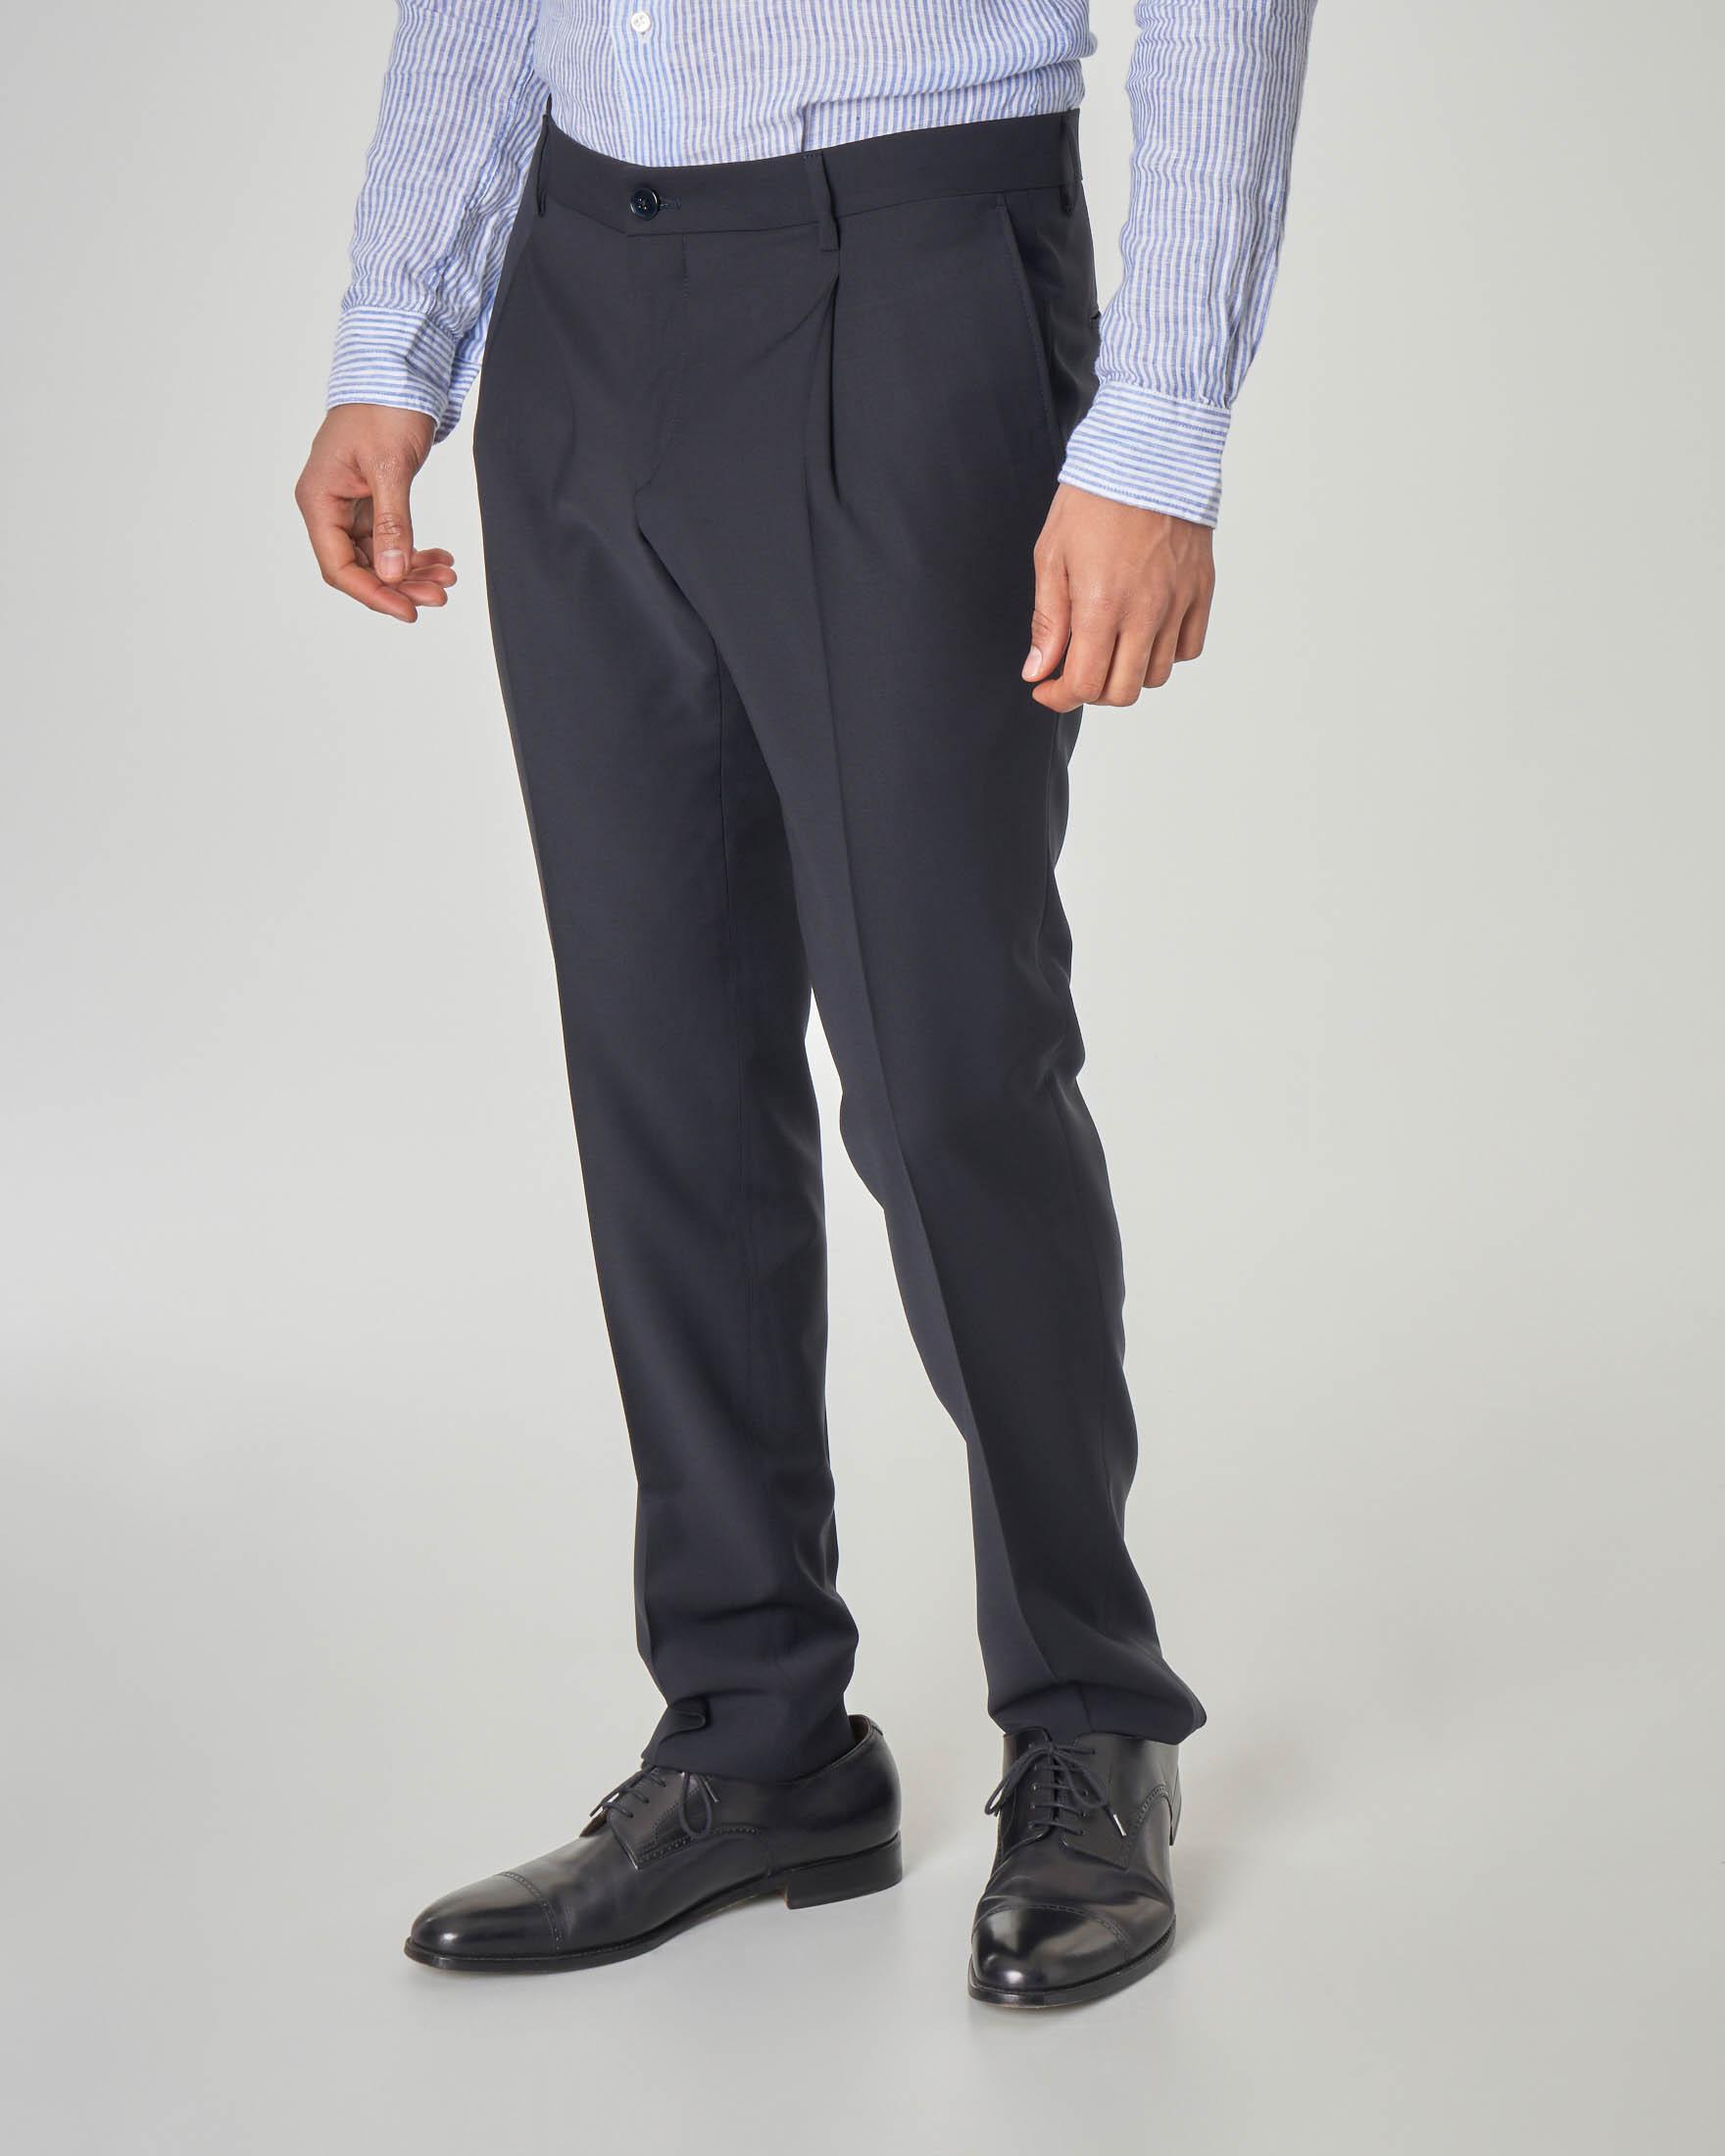 Pantalone blu in tela di lana con una pinces